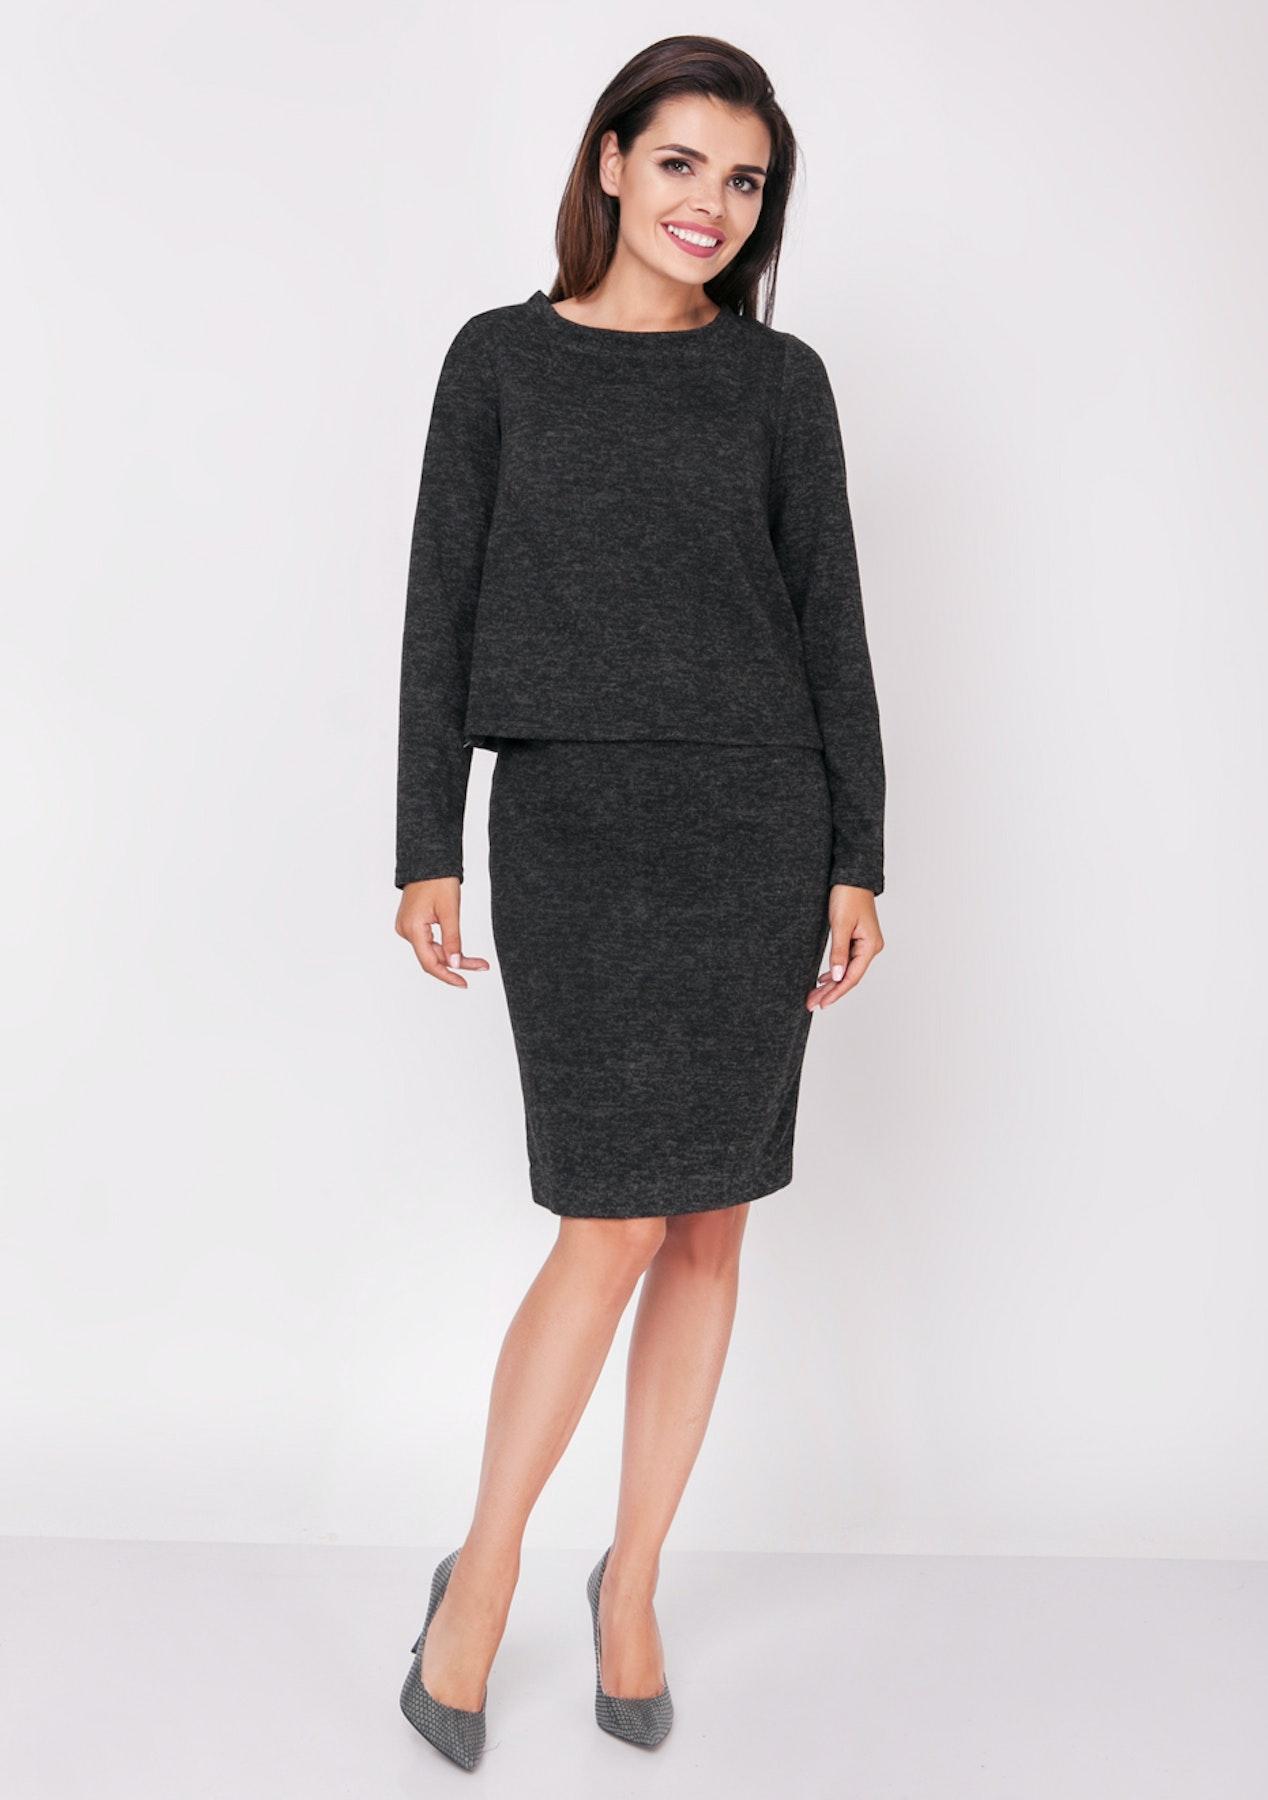 2c20dd86abdfd Foggy - Woven Skirt And Blouse - Black - European Designer Outlet - Onceit